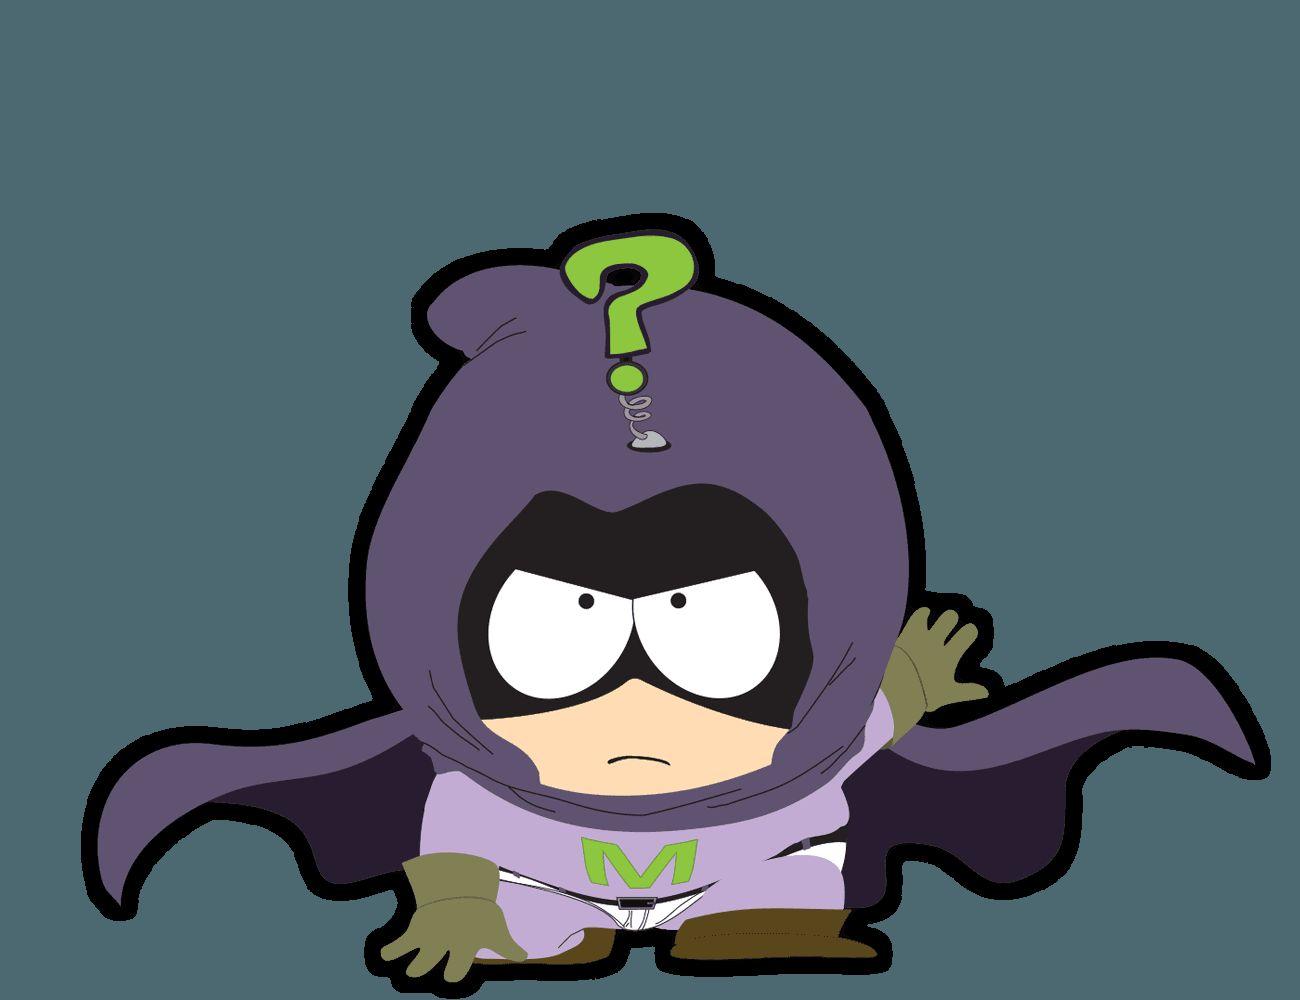 South Park Mysterion Meme Template